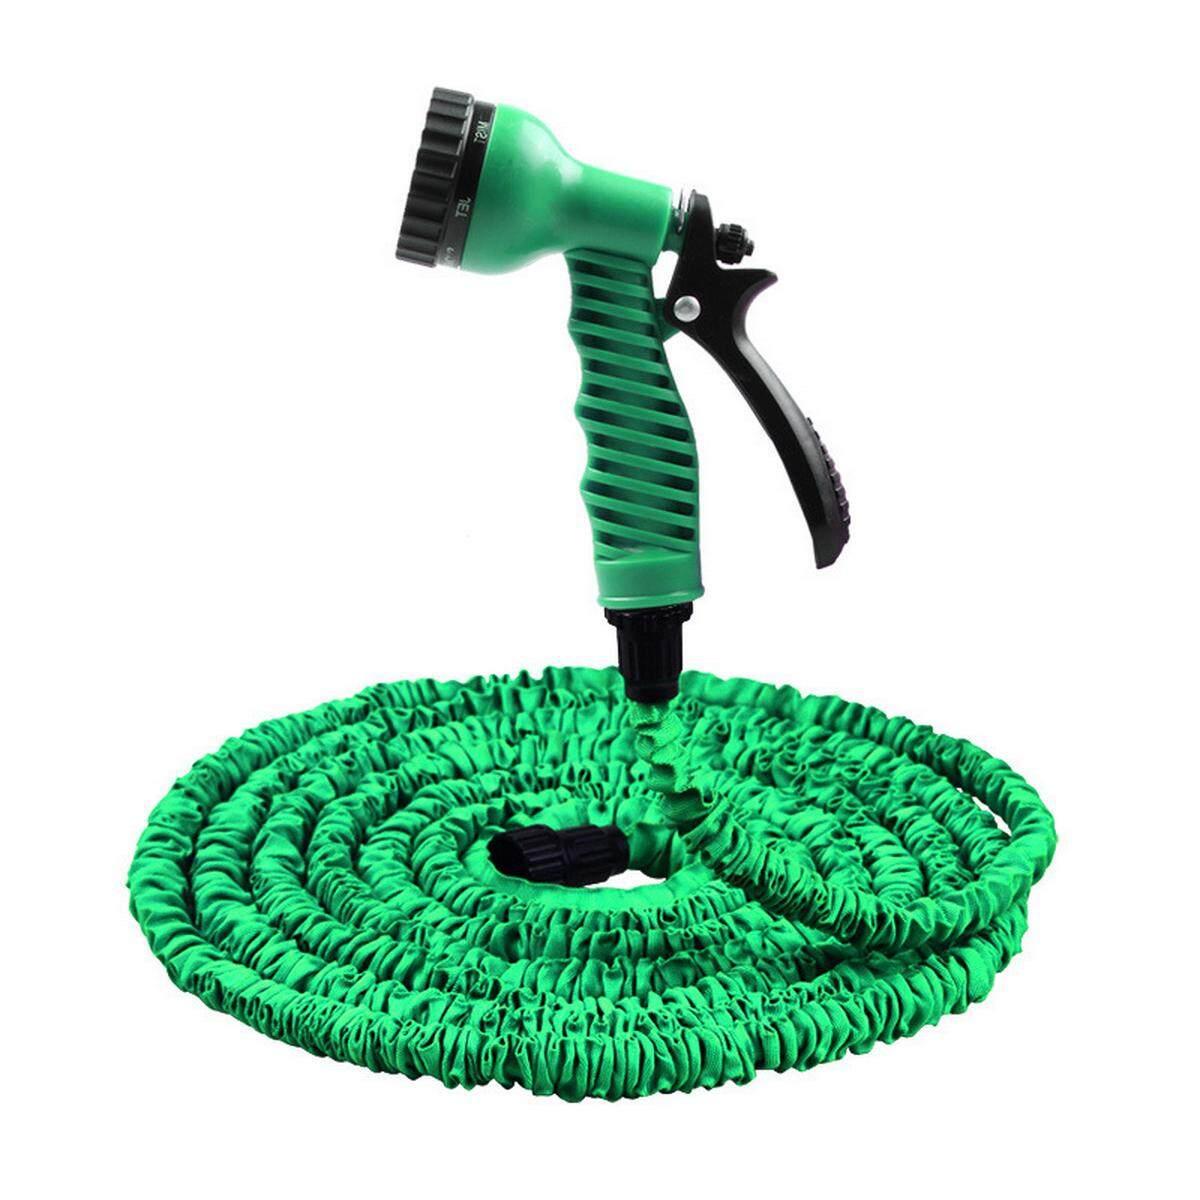 100FT High Pressure 3X Expandable Magic Flexible Water Hose for Garden, Car - Green